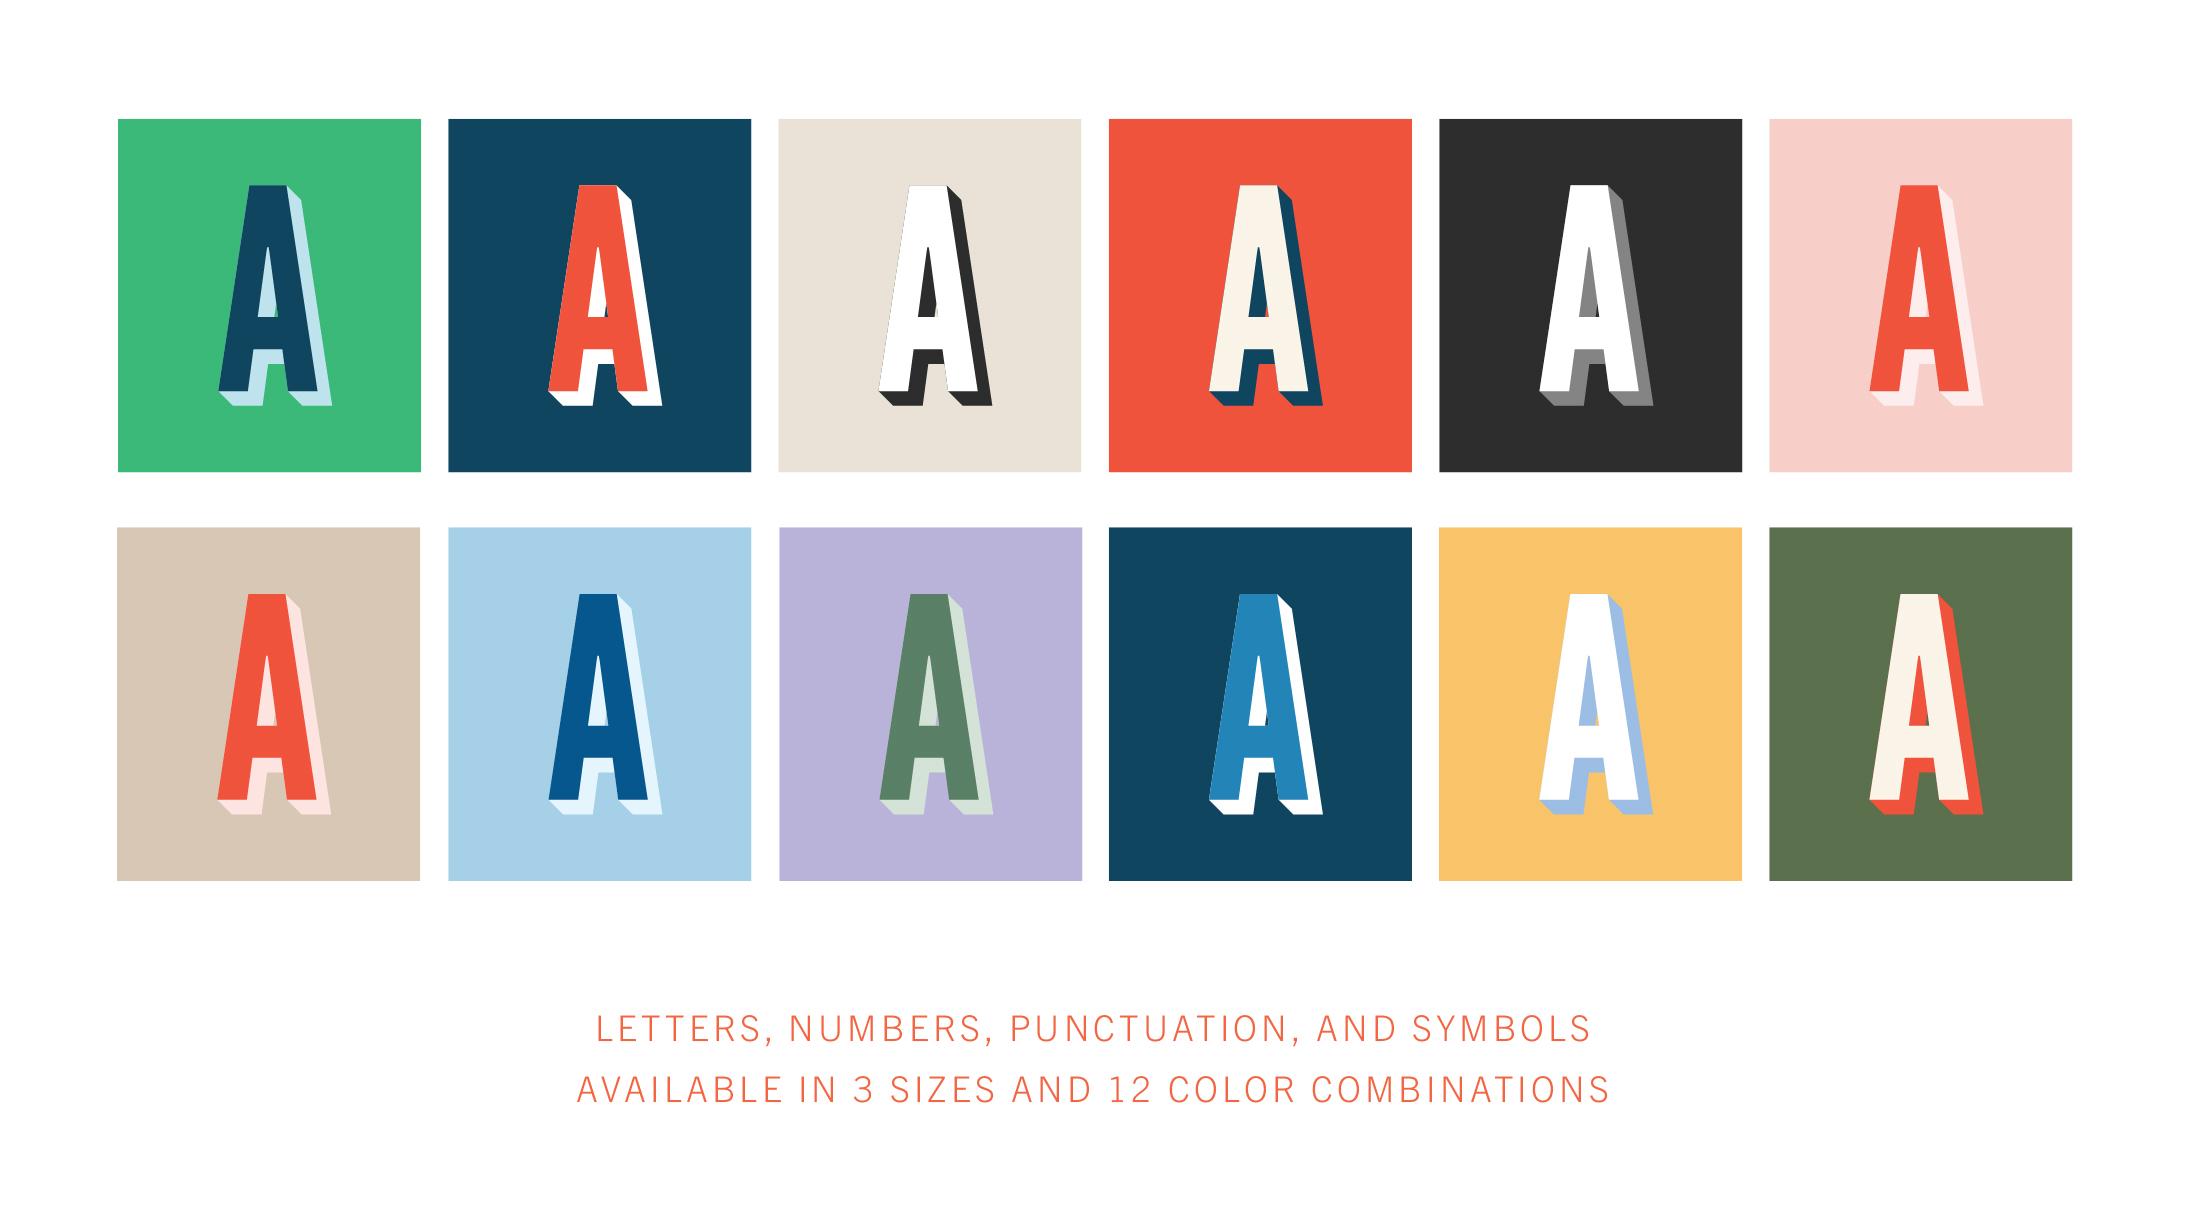 Alphabet_Art_Homepage_Assets-07.jpg